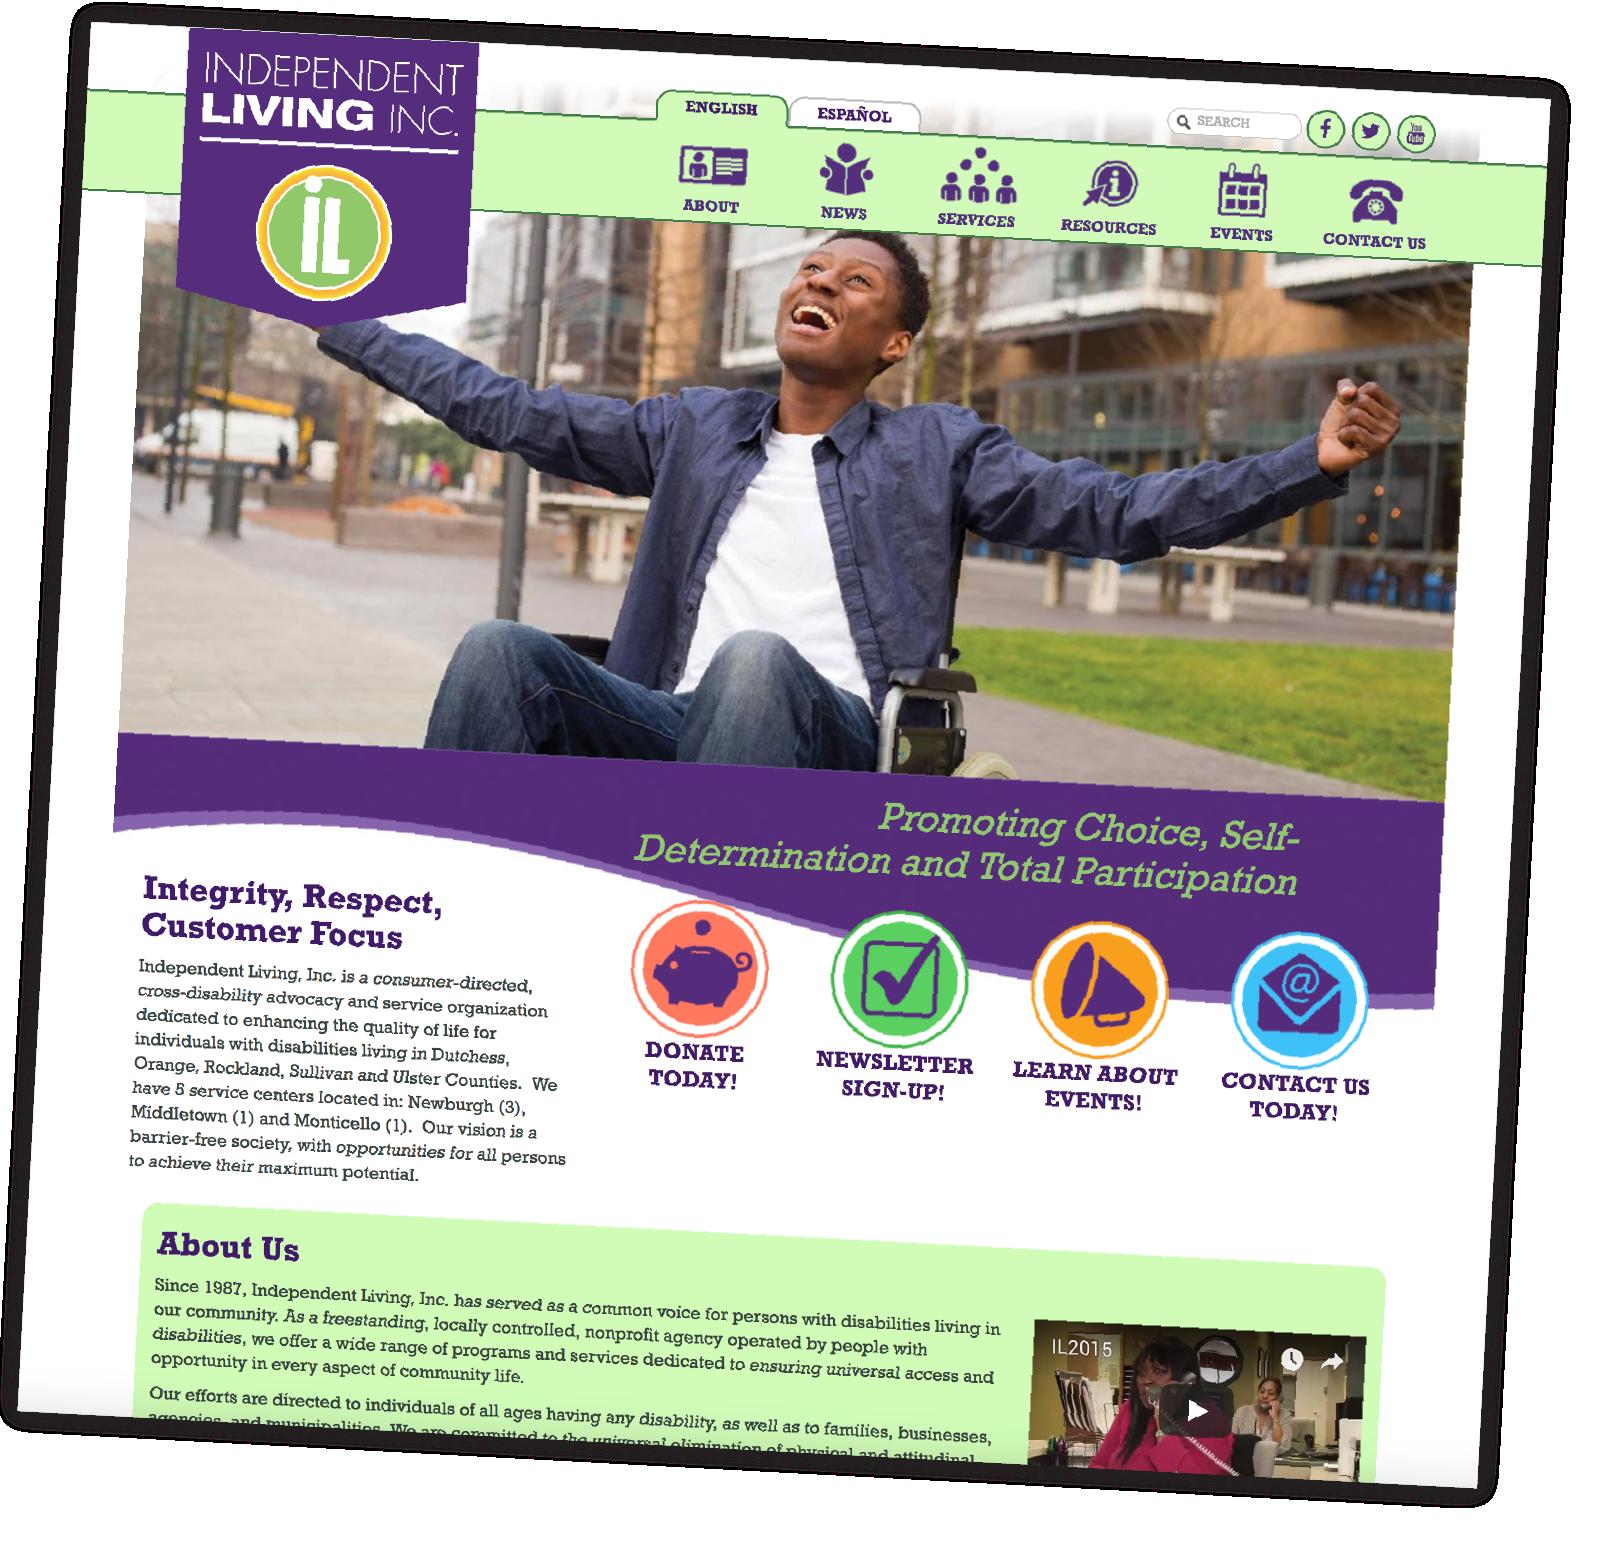 Independent living website